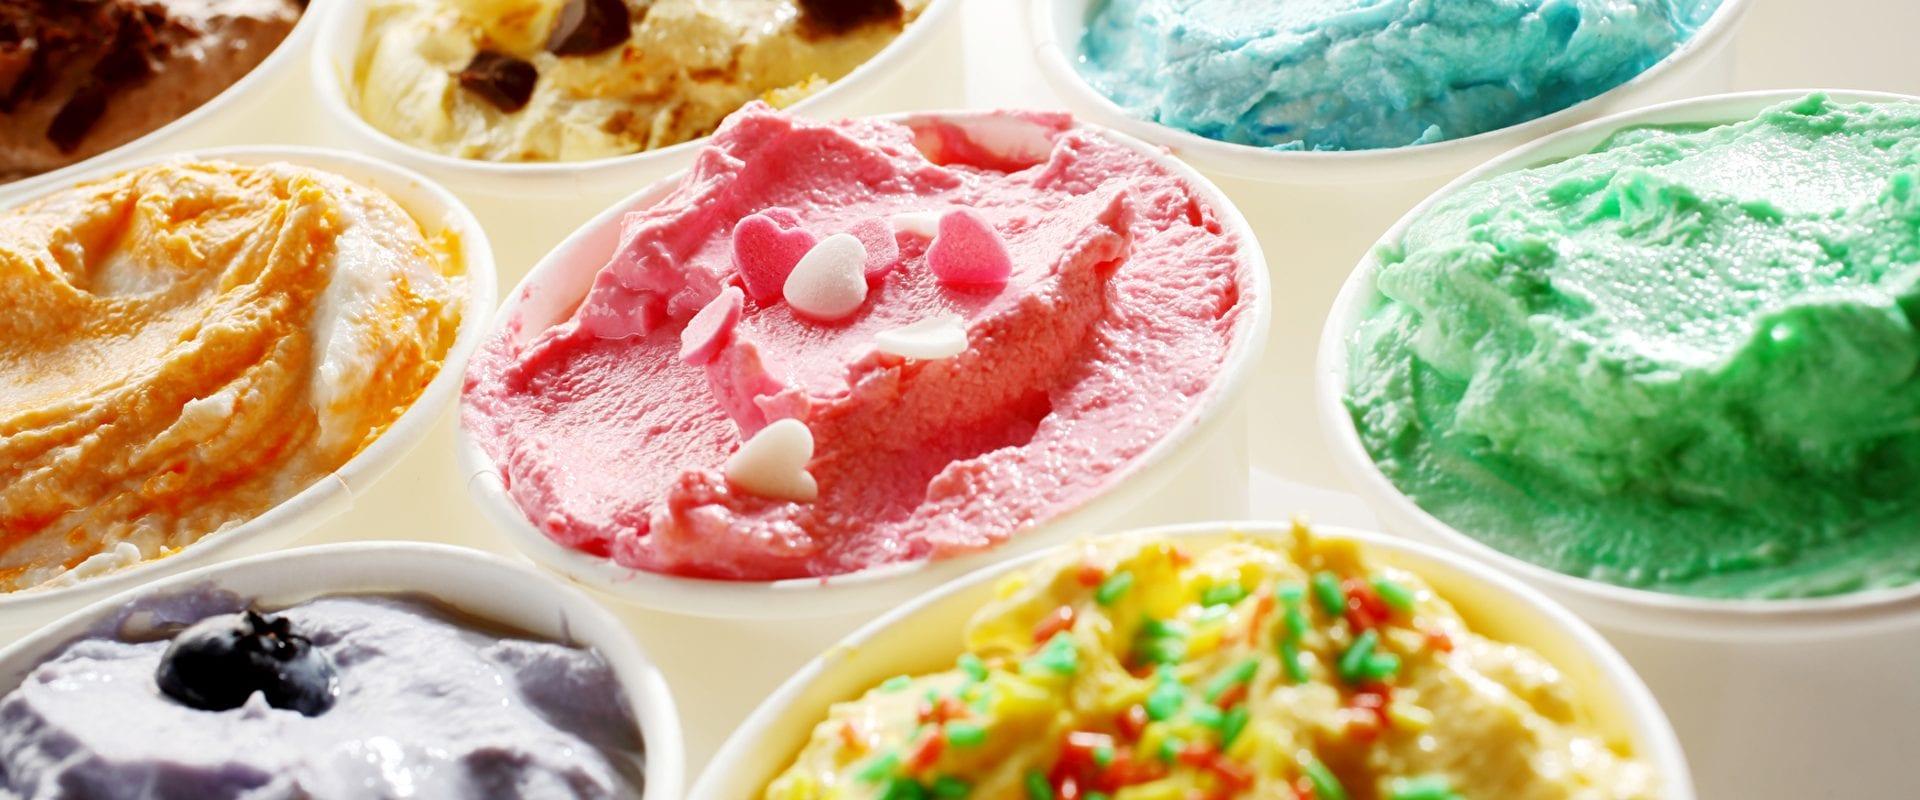 Ice cream: 10 tasty facts